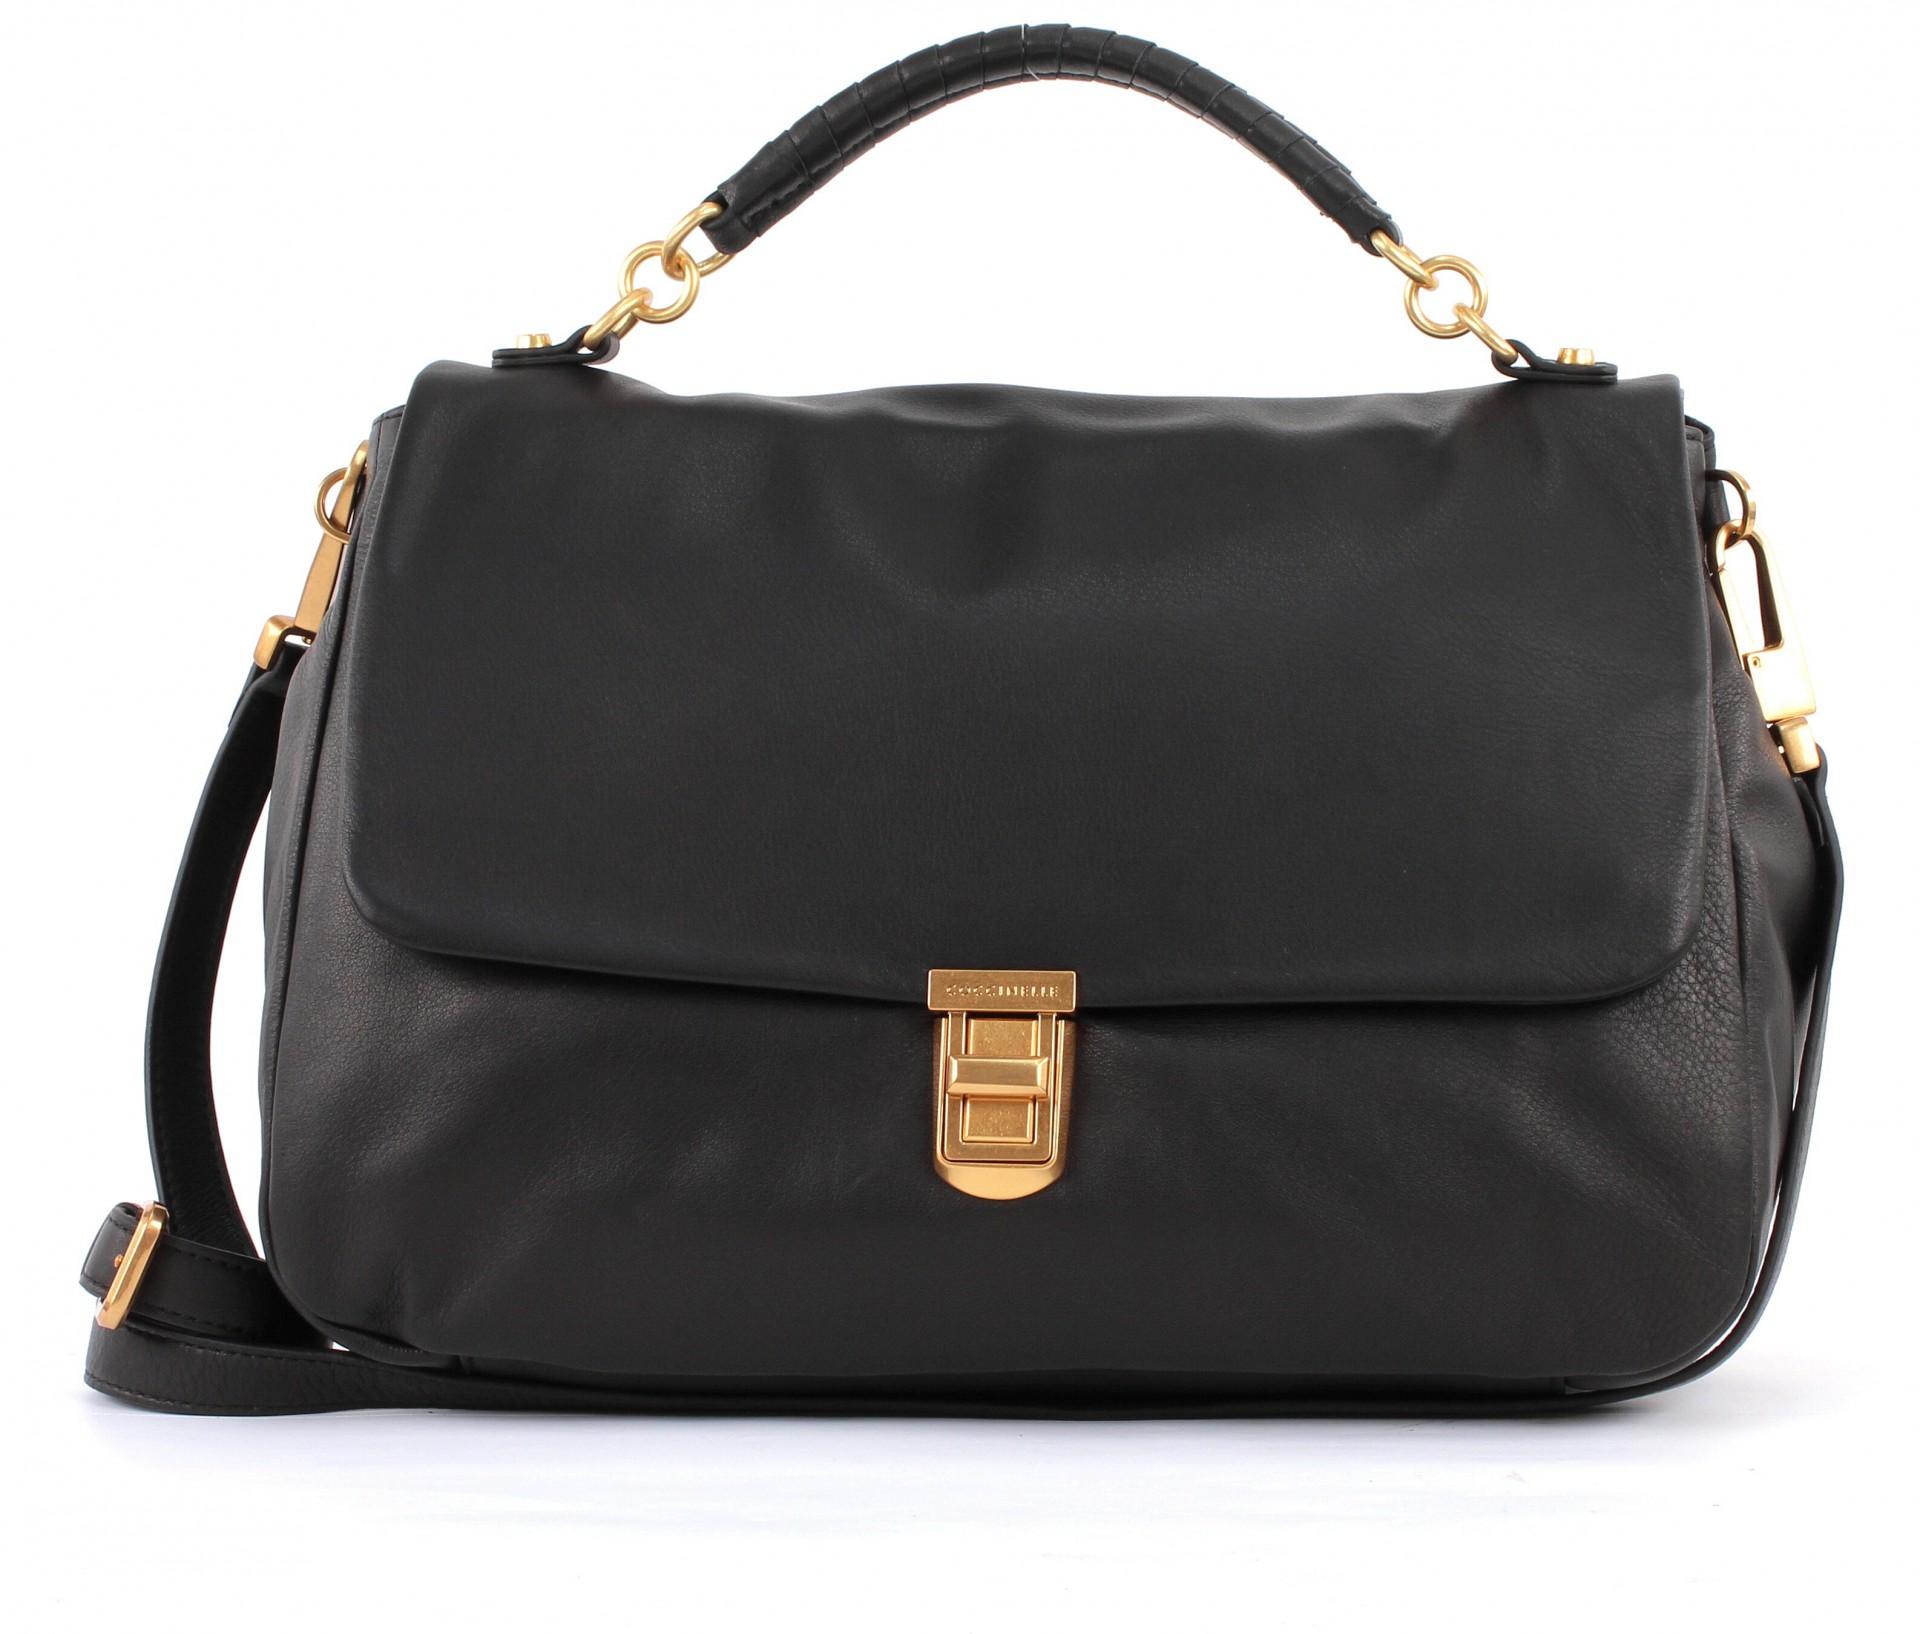 coccinelle oscar lux shoulderbag tasche umh ngetasche handtasche damen schwarz ebay. Black Bedroom Furniture Sets. Home Design Ideas